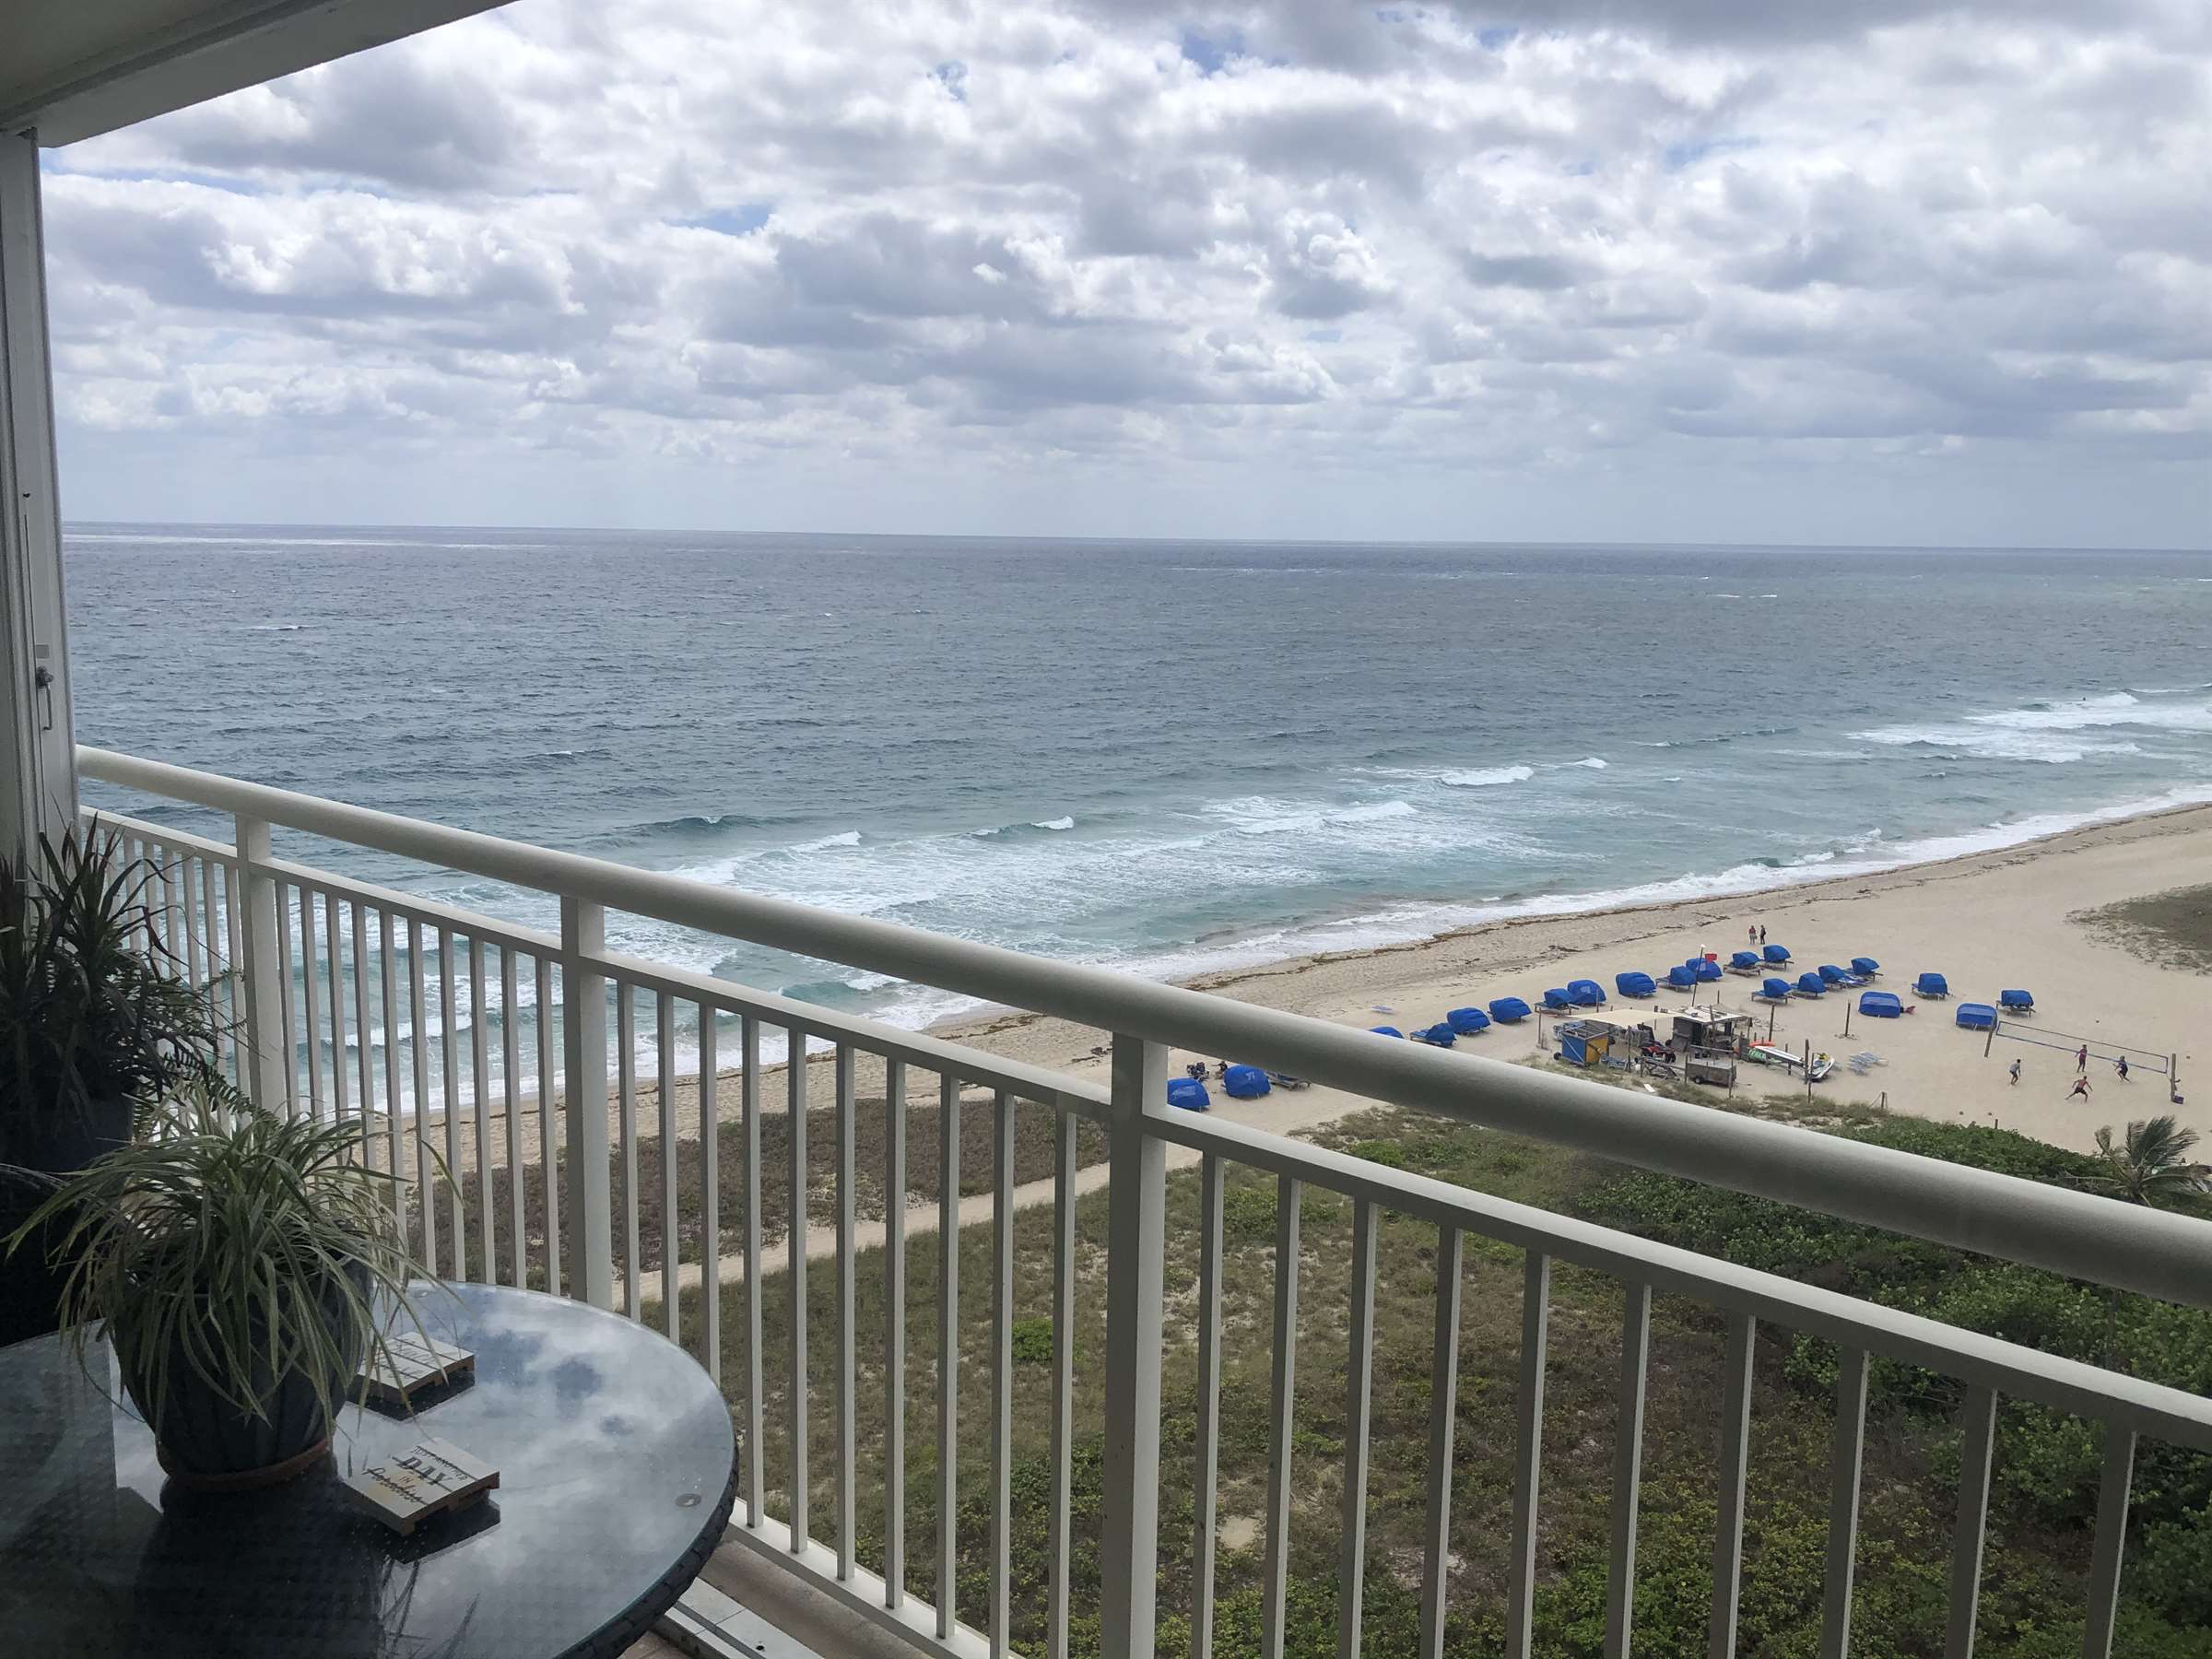 710 North Ocean Blvd, #1110, Pompano Beach, FL 33062